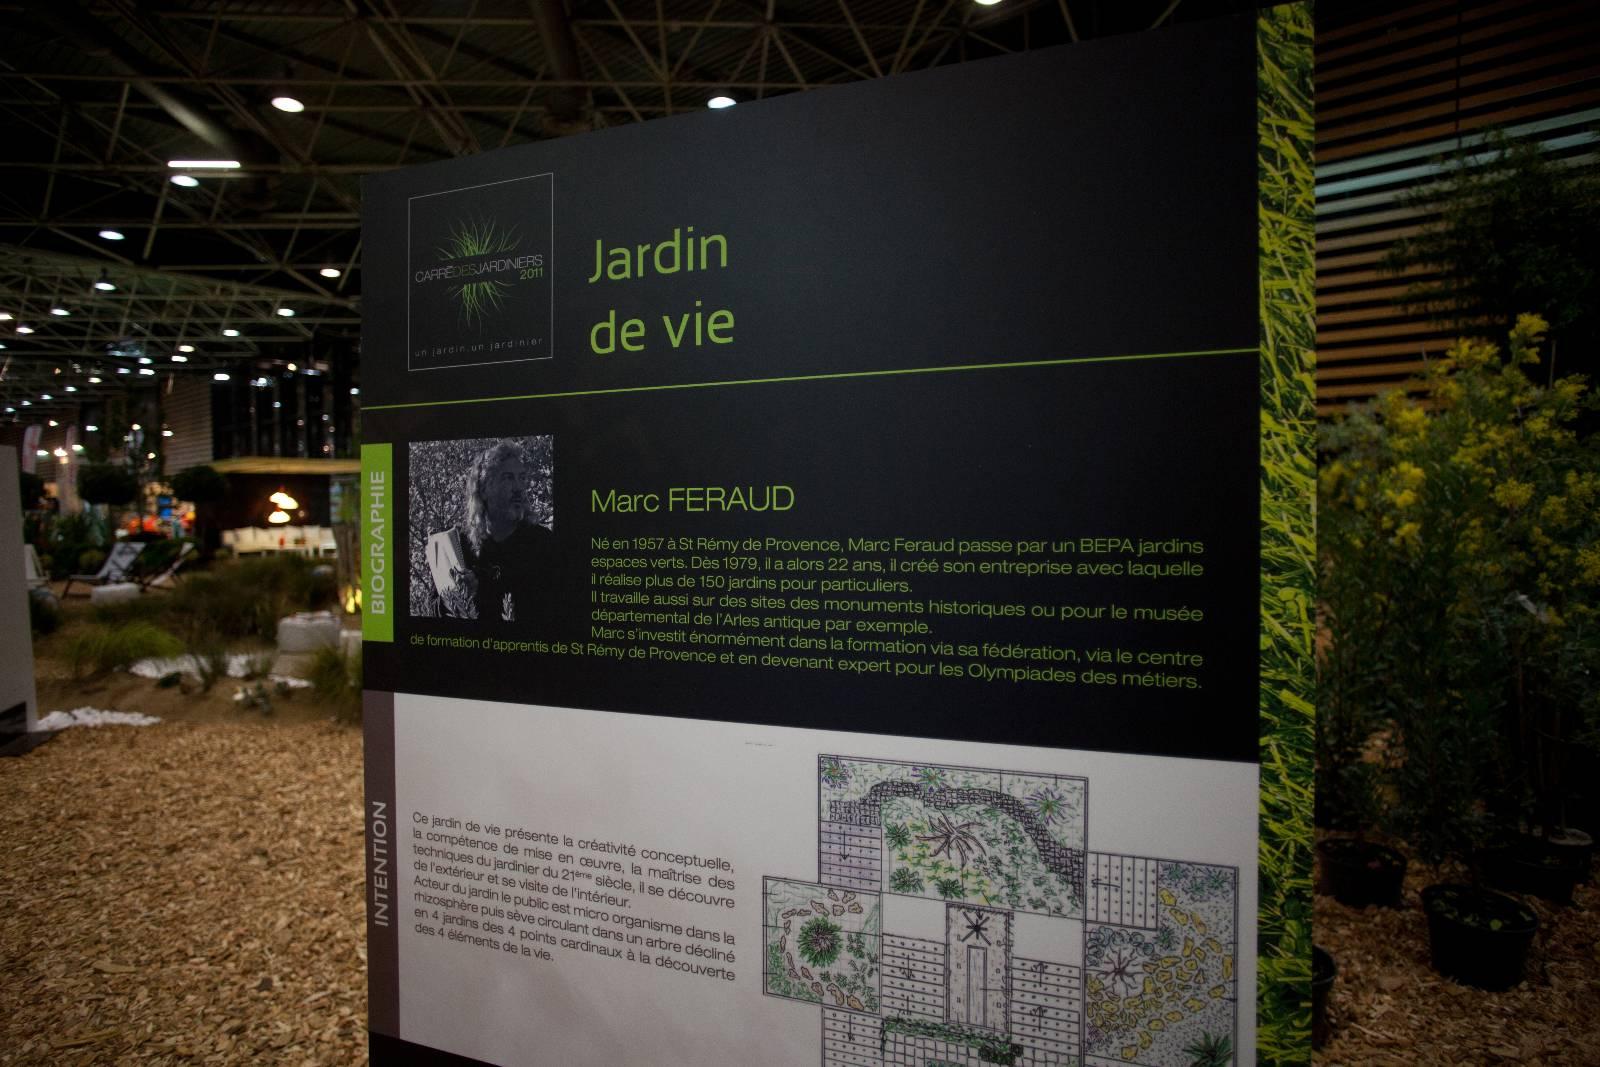 Carr des jardiniers l 39 esprit des jardins for Jardin de jardiniers